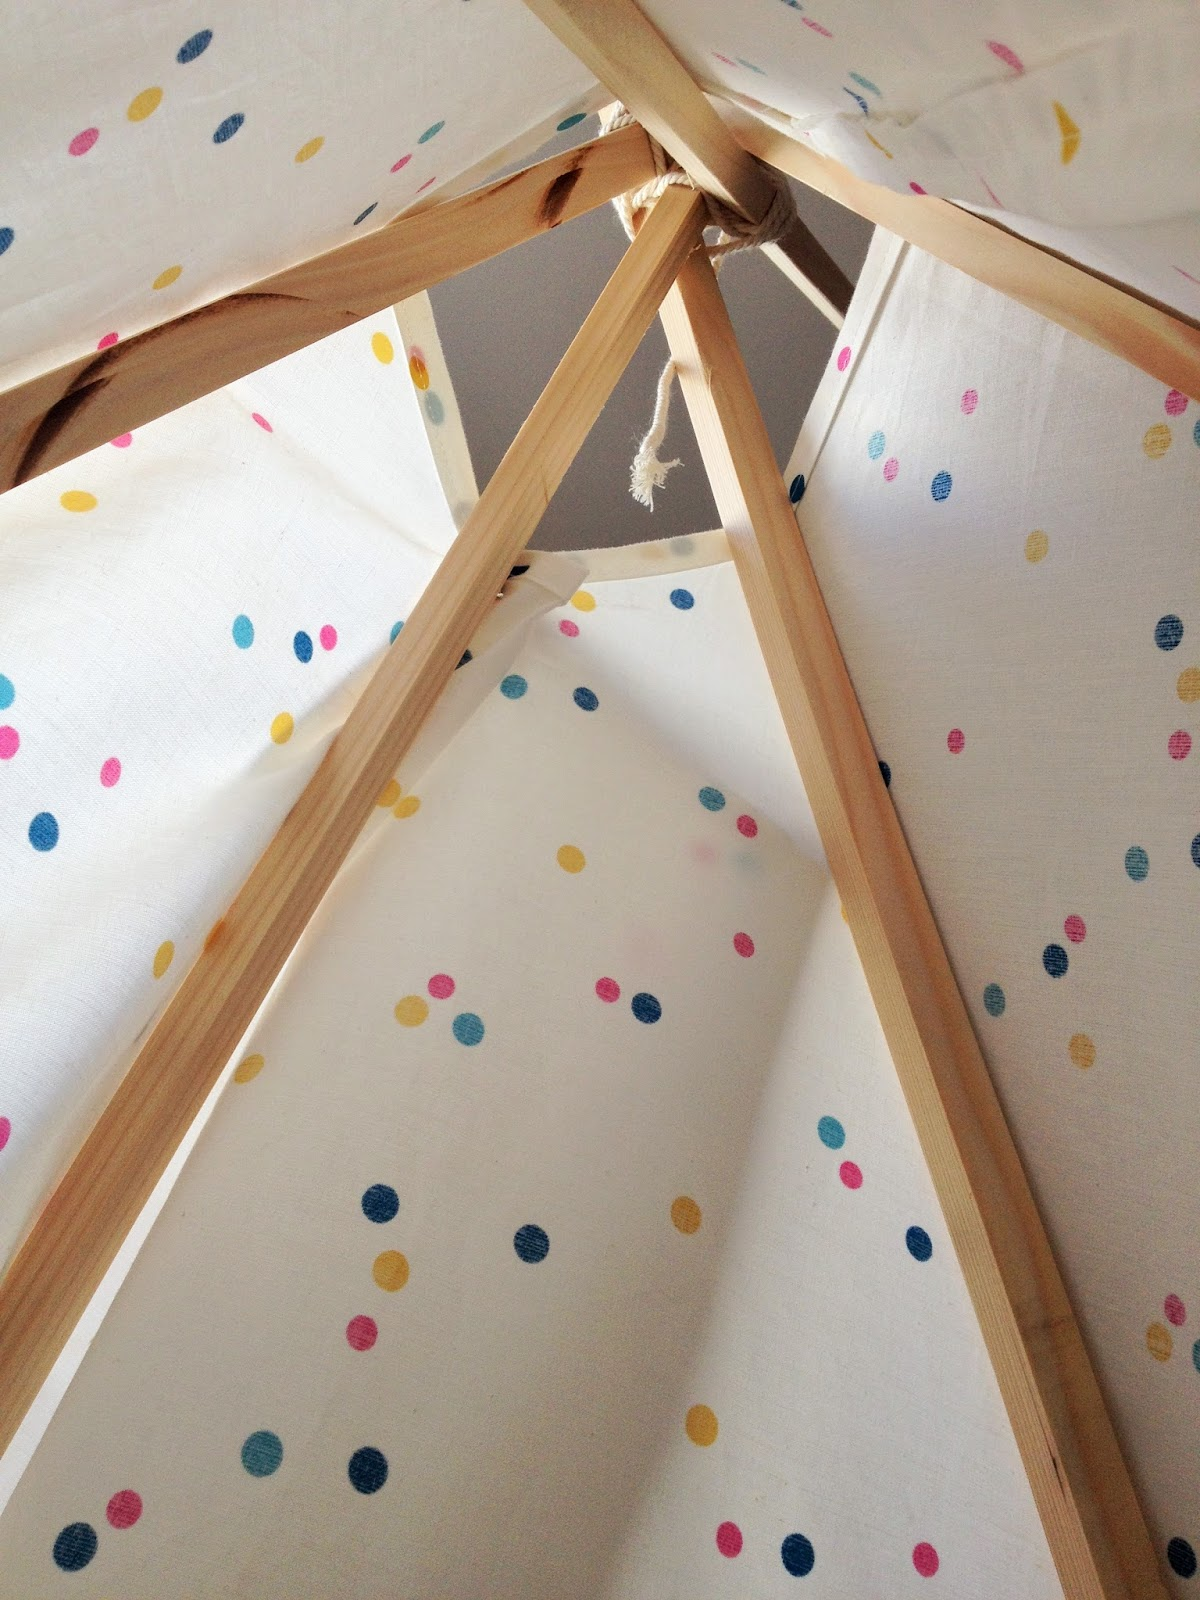 Connu GlobeShoppeuse: DIY : mon tipi pour enfant home-made ! EZ36